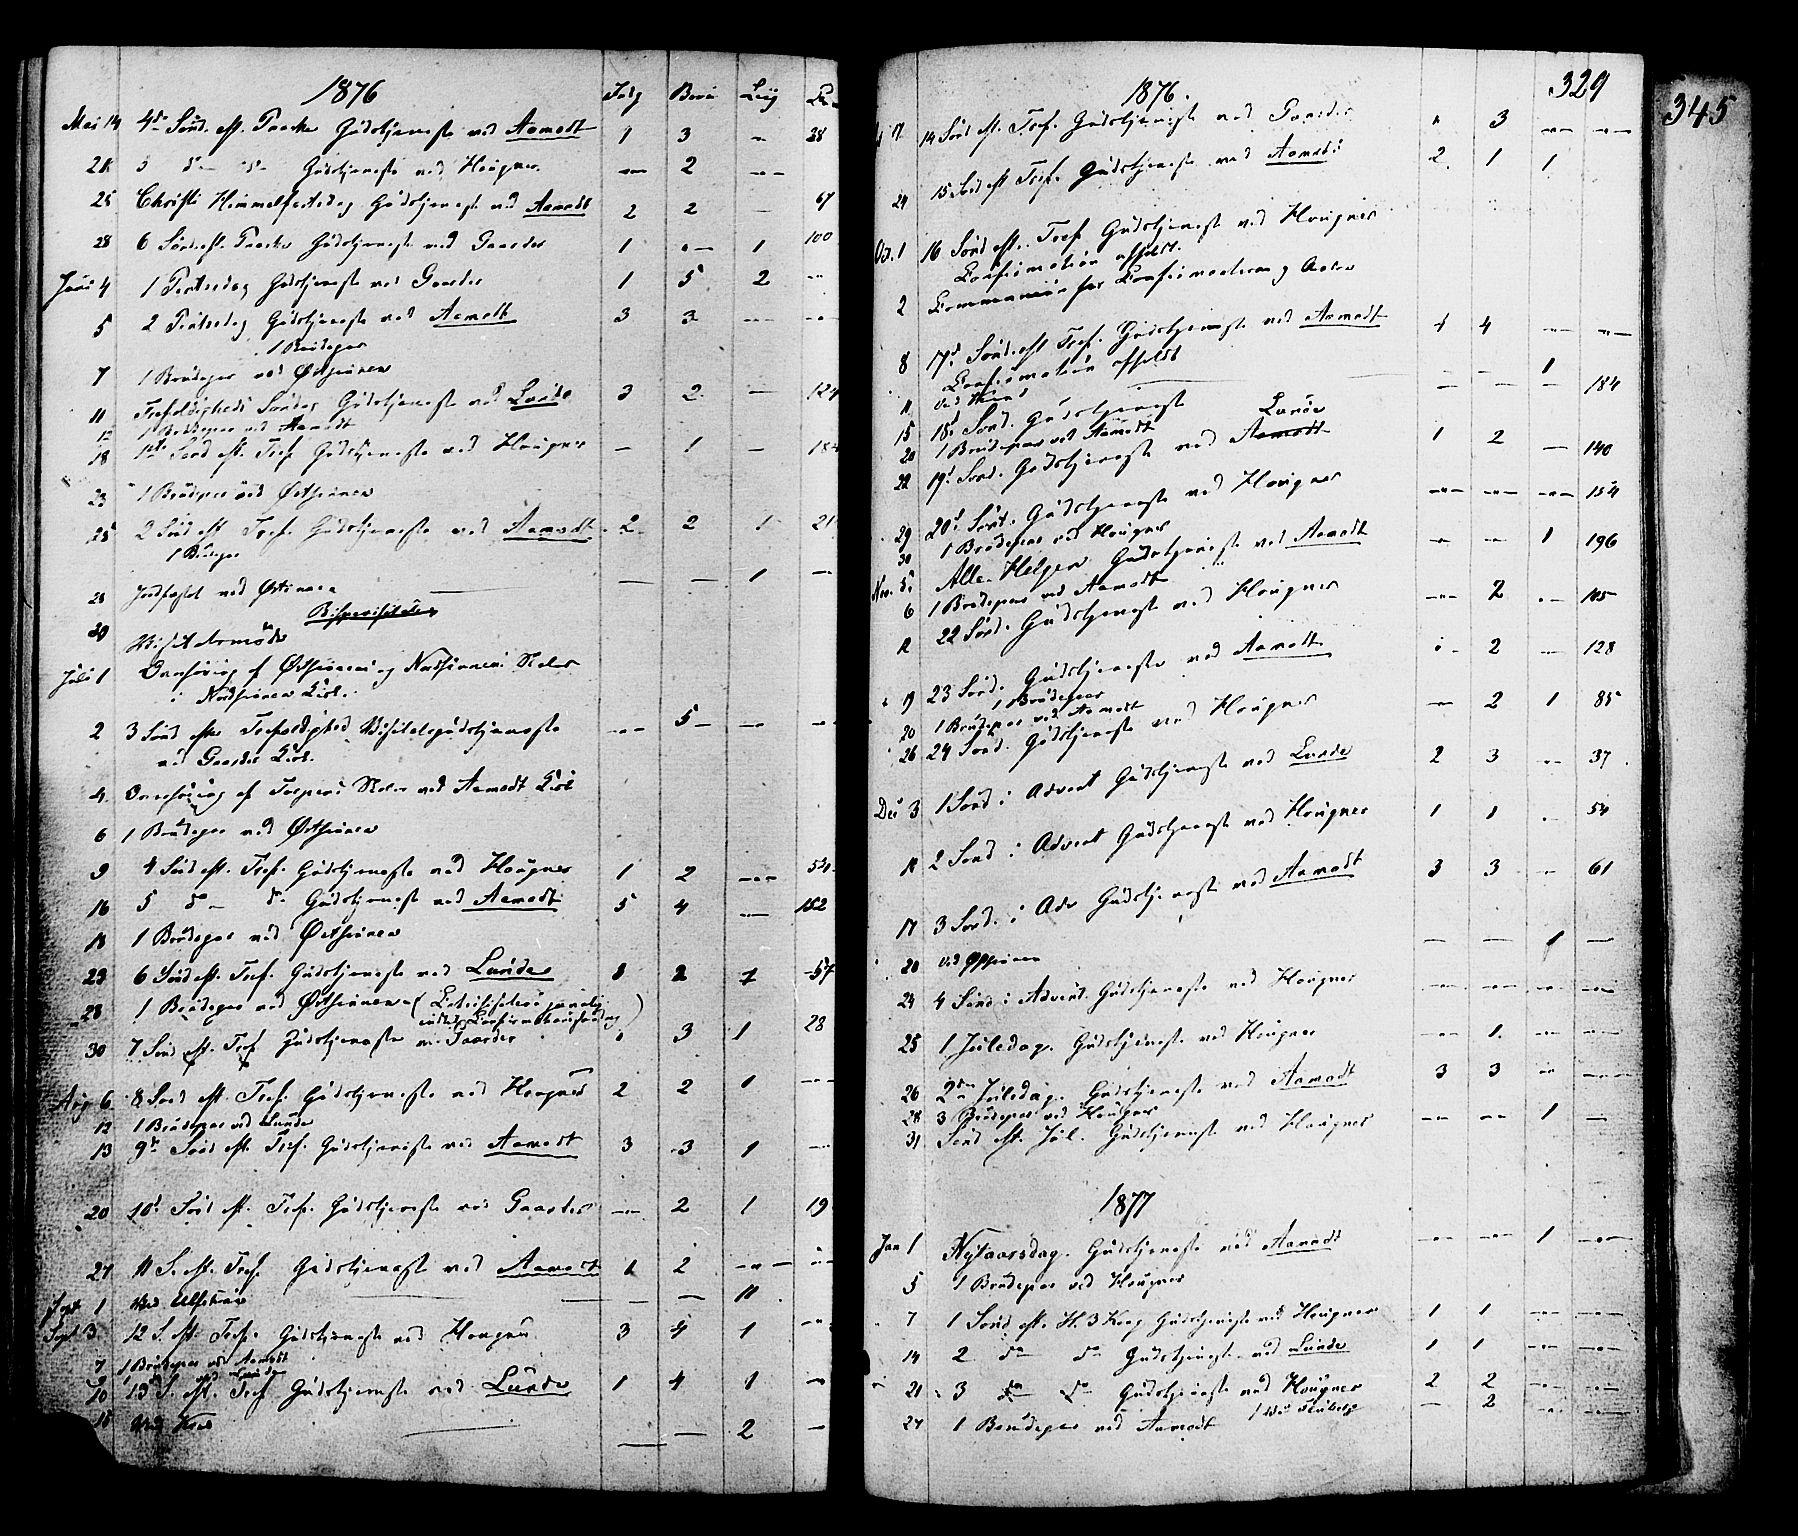 SAH, Nordre Land prestekontor, Ministerialbok nr. 2, 1872-1881, s. 329